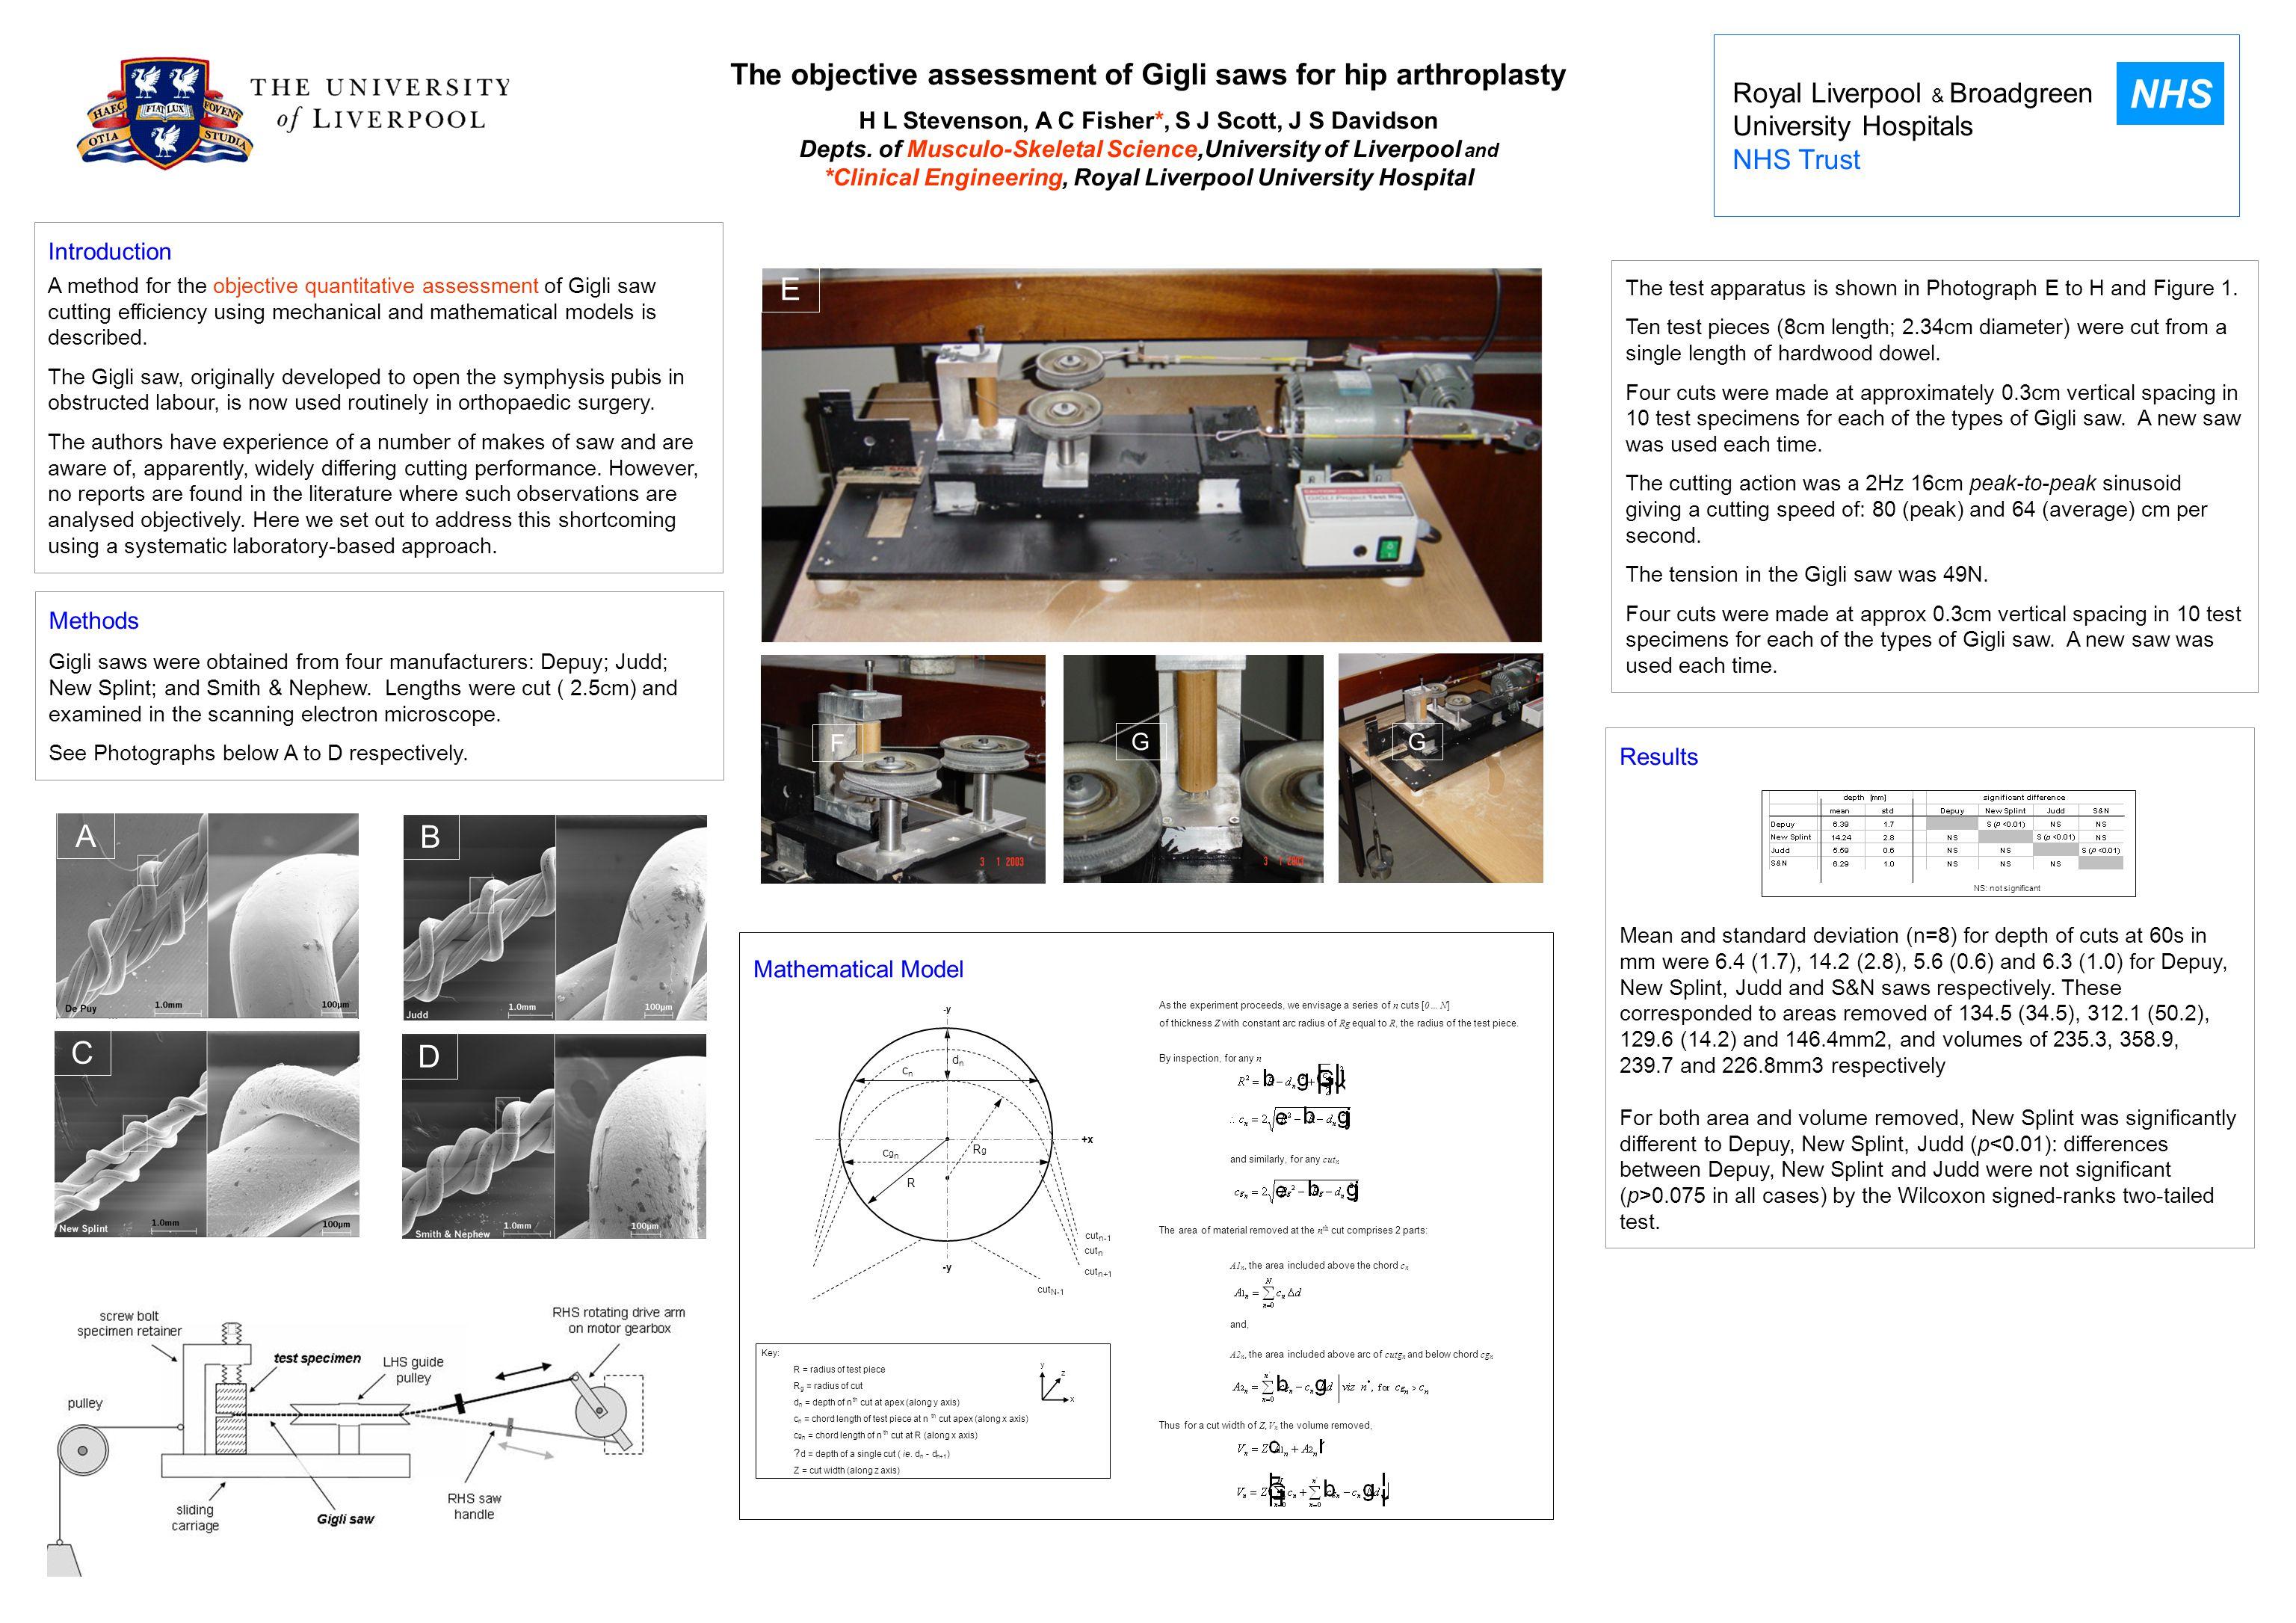 The objective assessment of Gigli saws for hip arthroplasty H L Stevenson, A C Fisher*, S J Scott, J S Davidson Depts. of Musculo-Skeletal Science,Uni